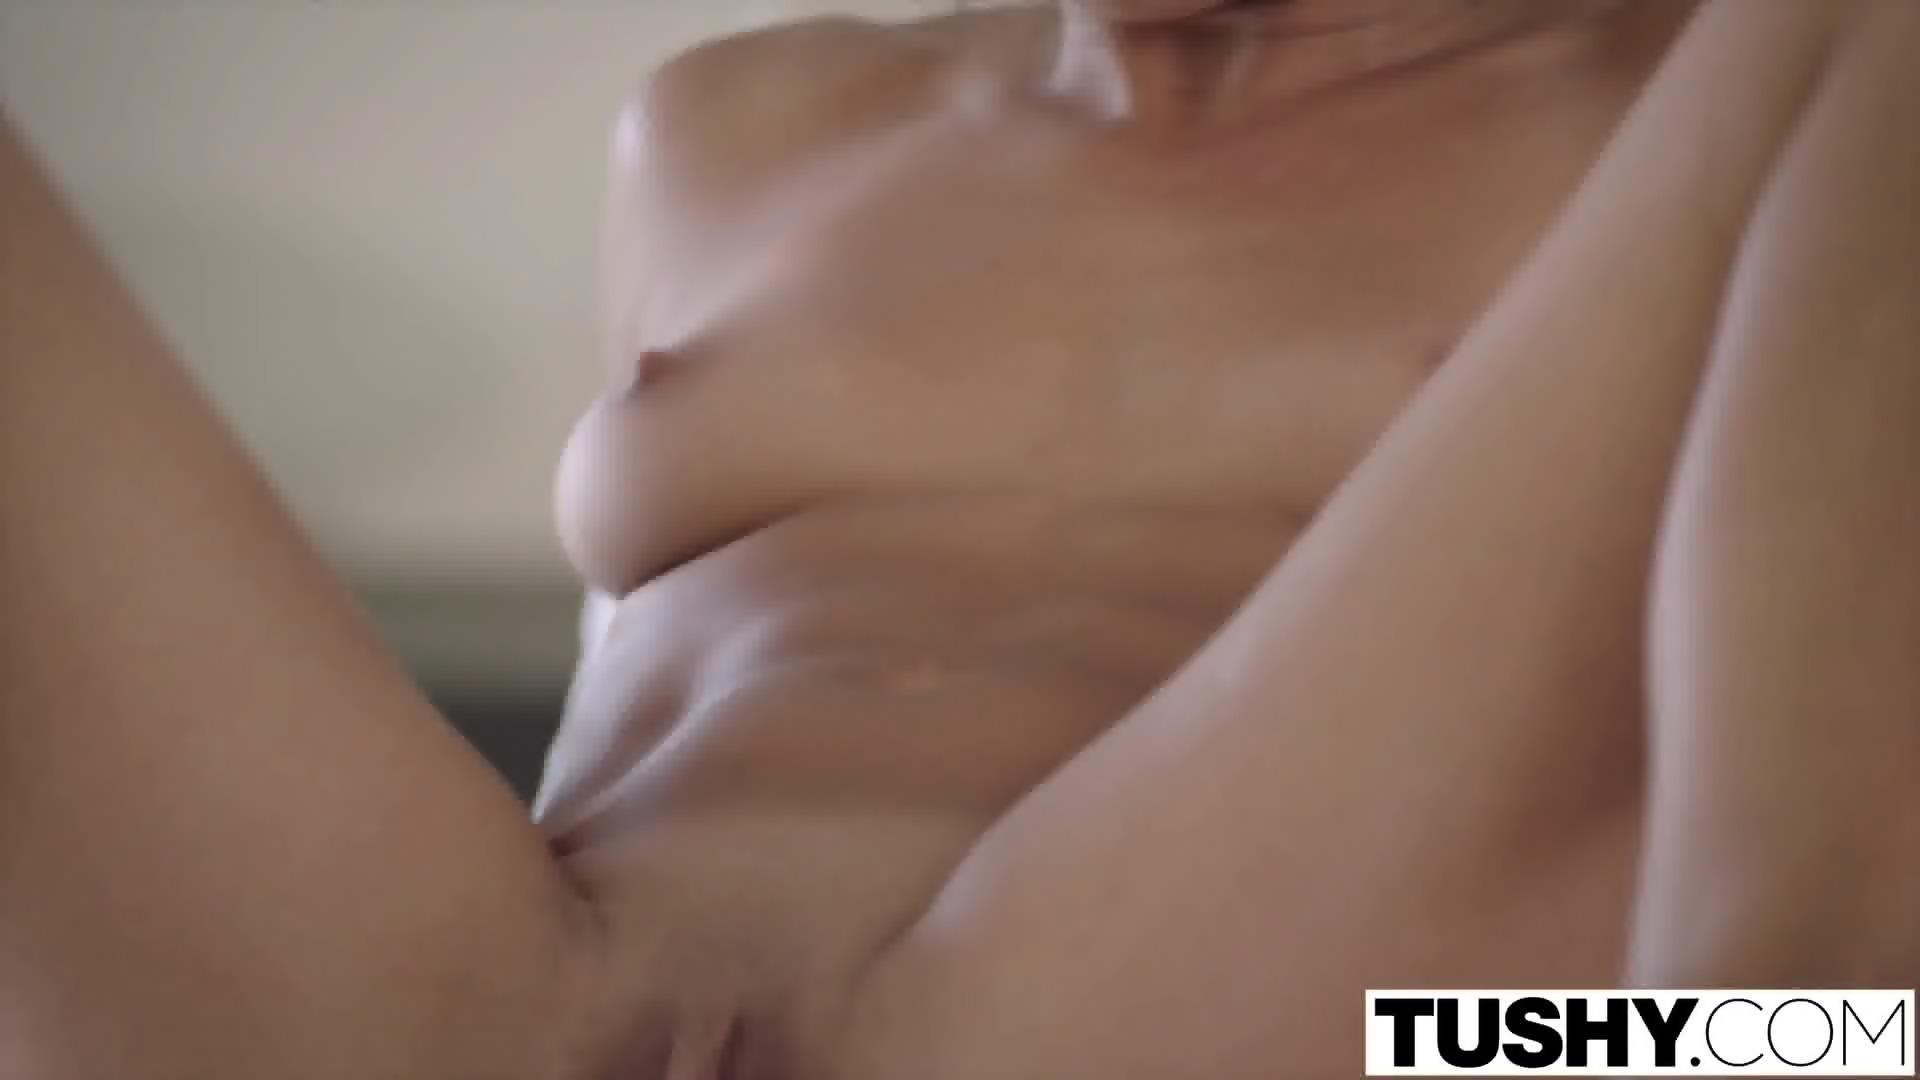 Erotic Pictures Hot goo gangbang hentai